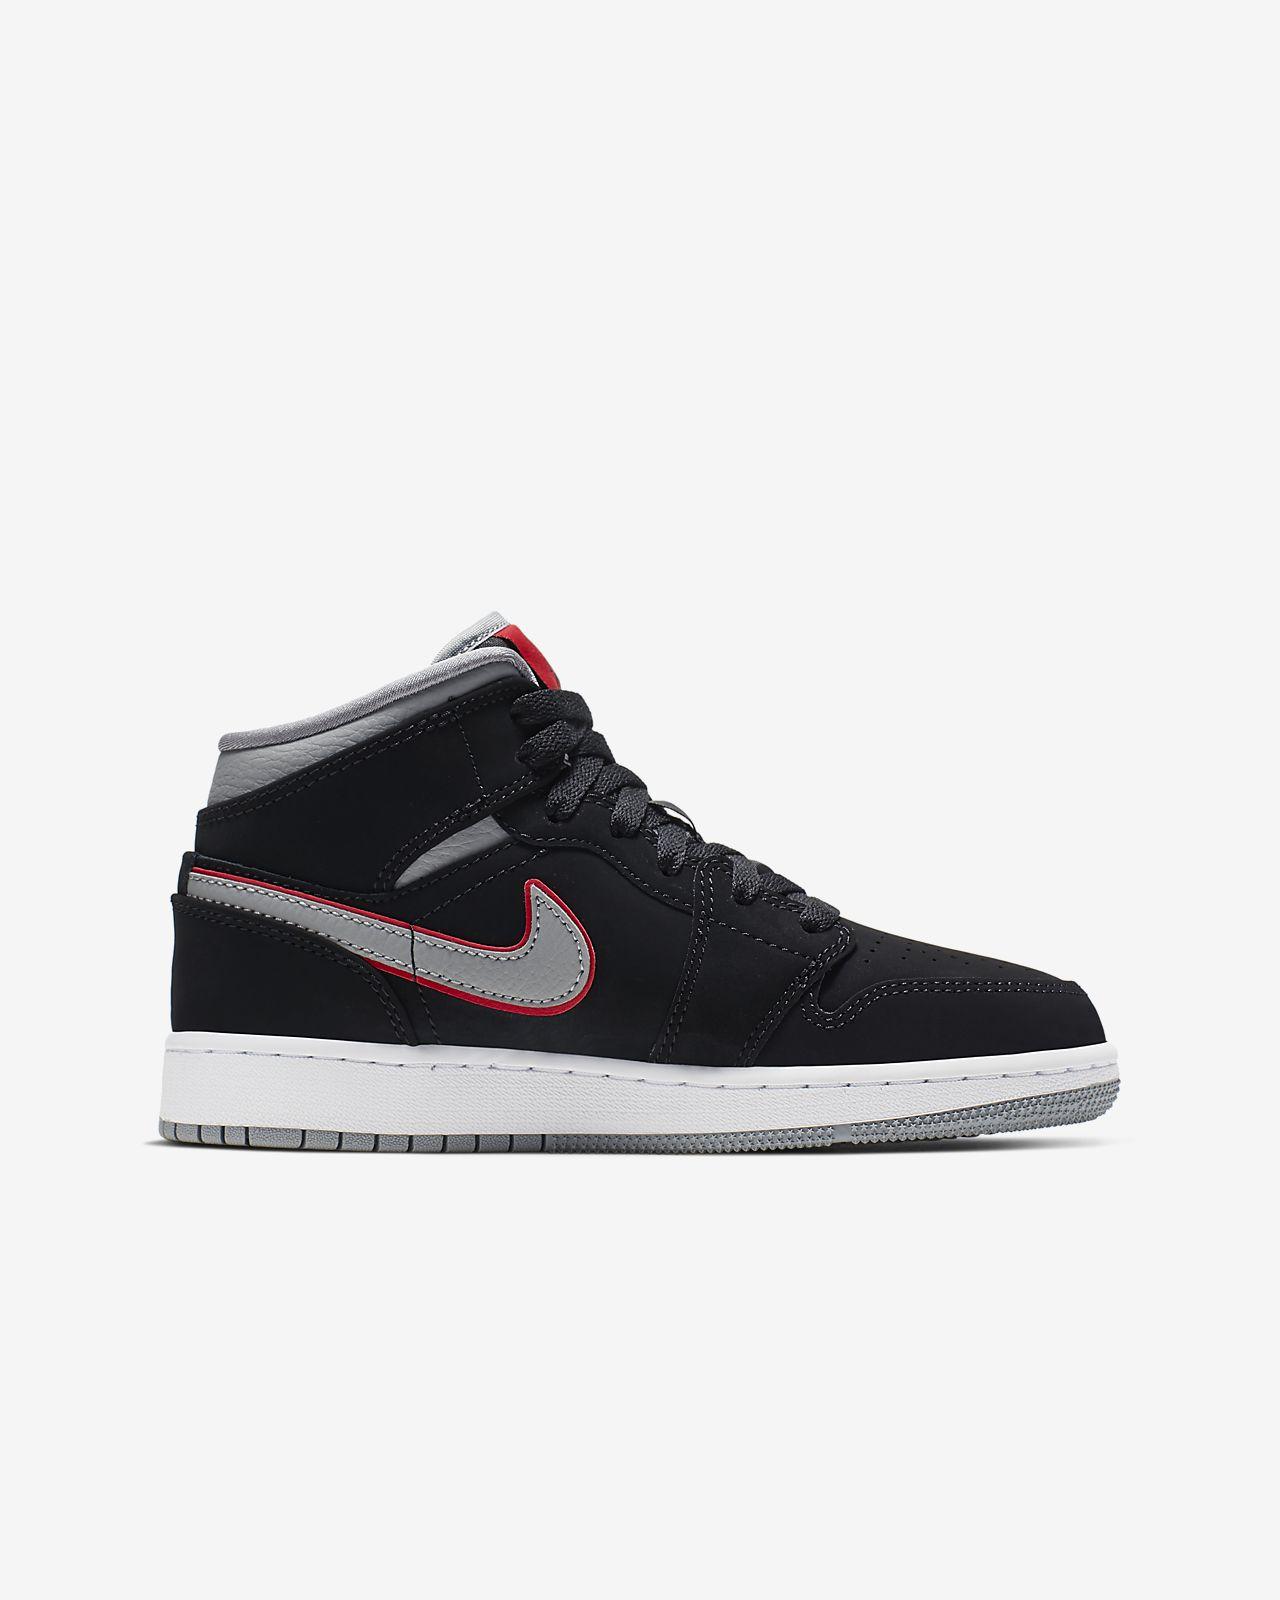 44323eb31981 Air Jordan 1 Mid Older Kids  Shoe. Nike.com GB